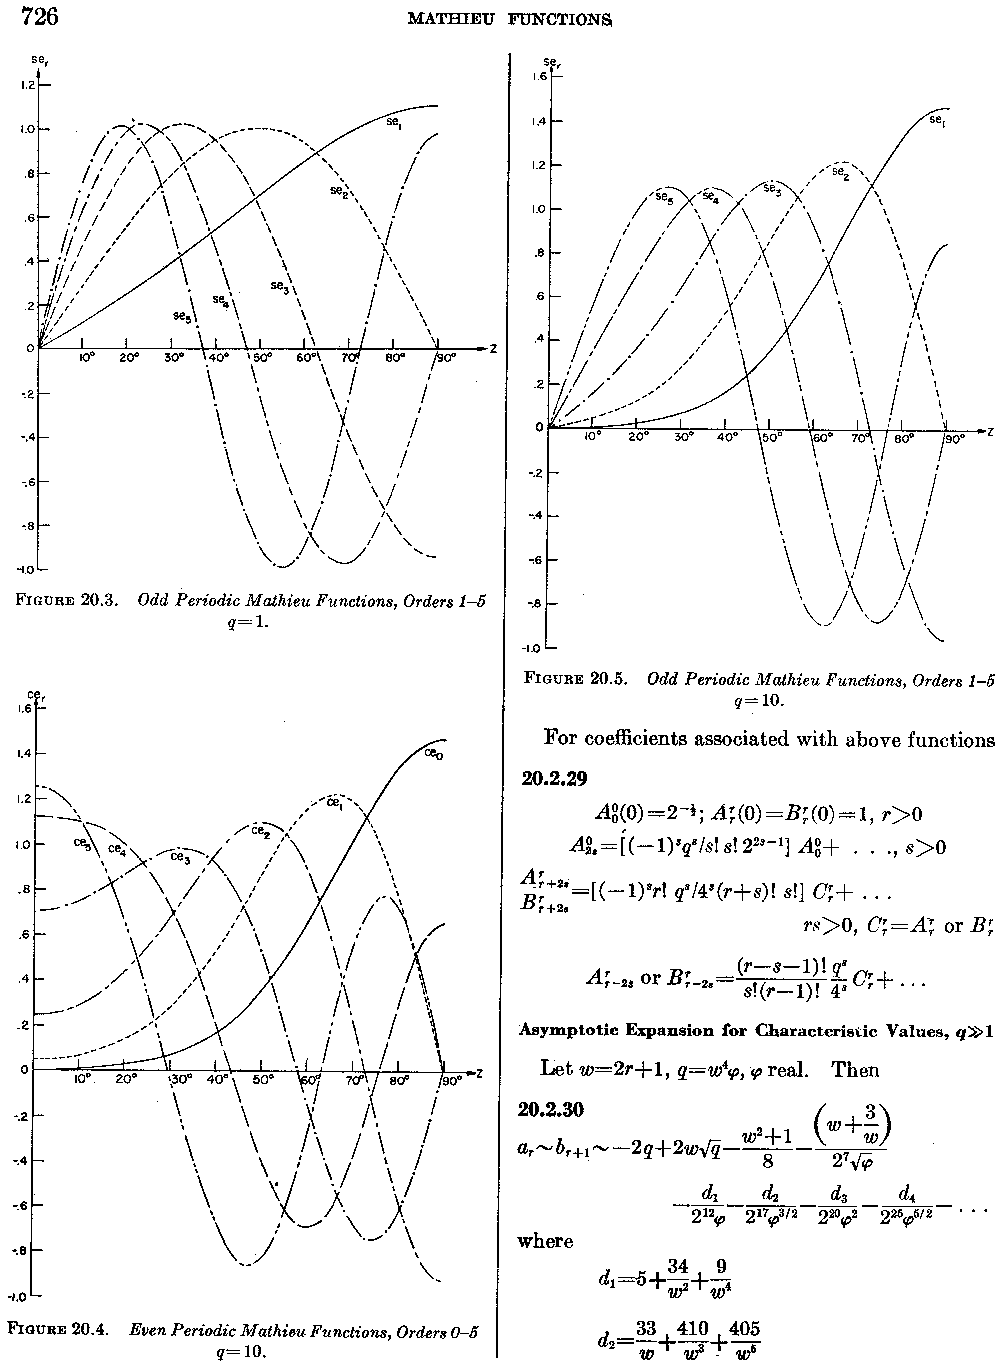 Applied Mathematics Series 55, p. 726